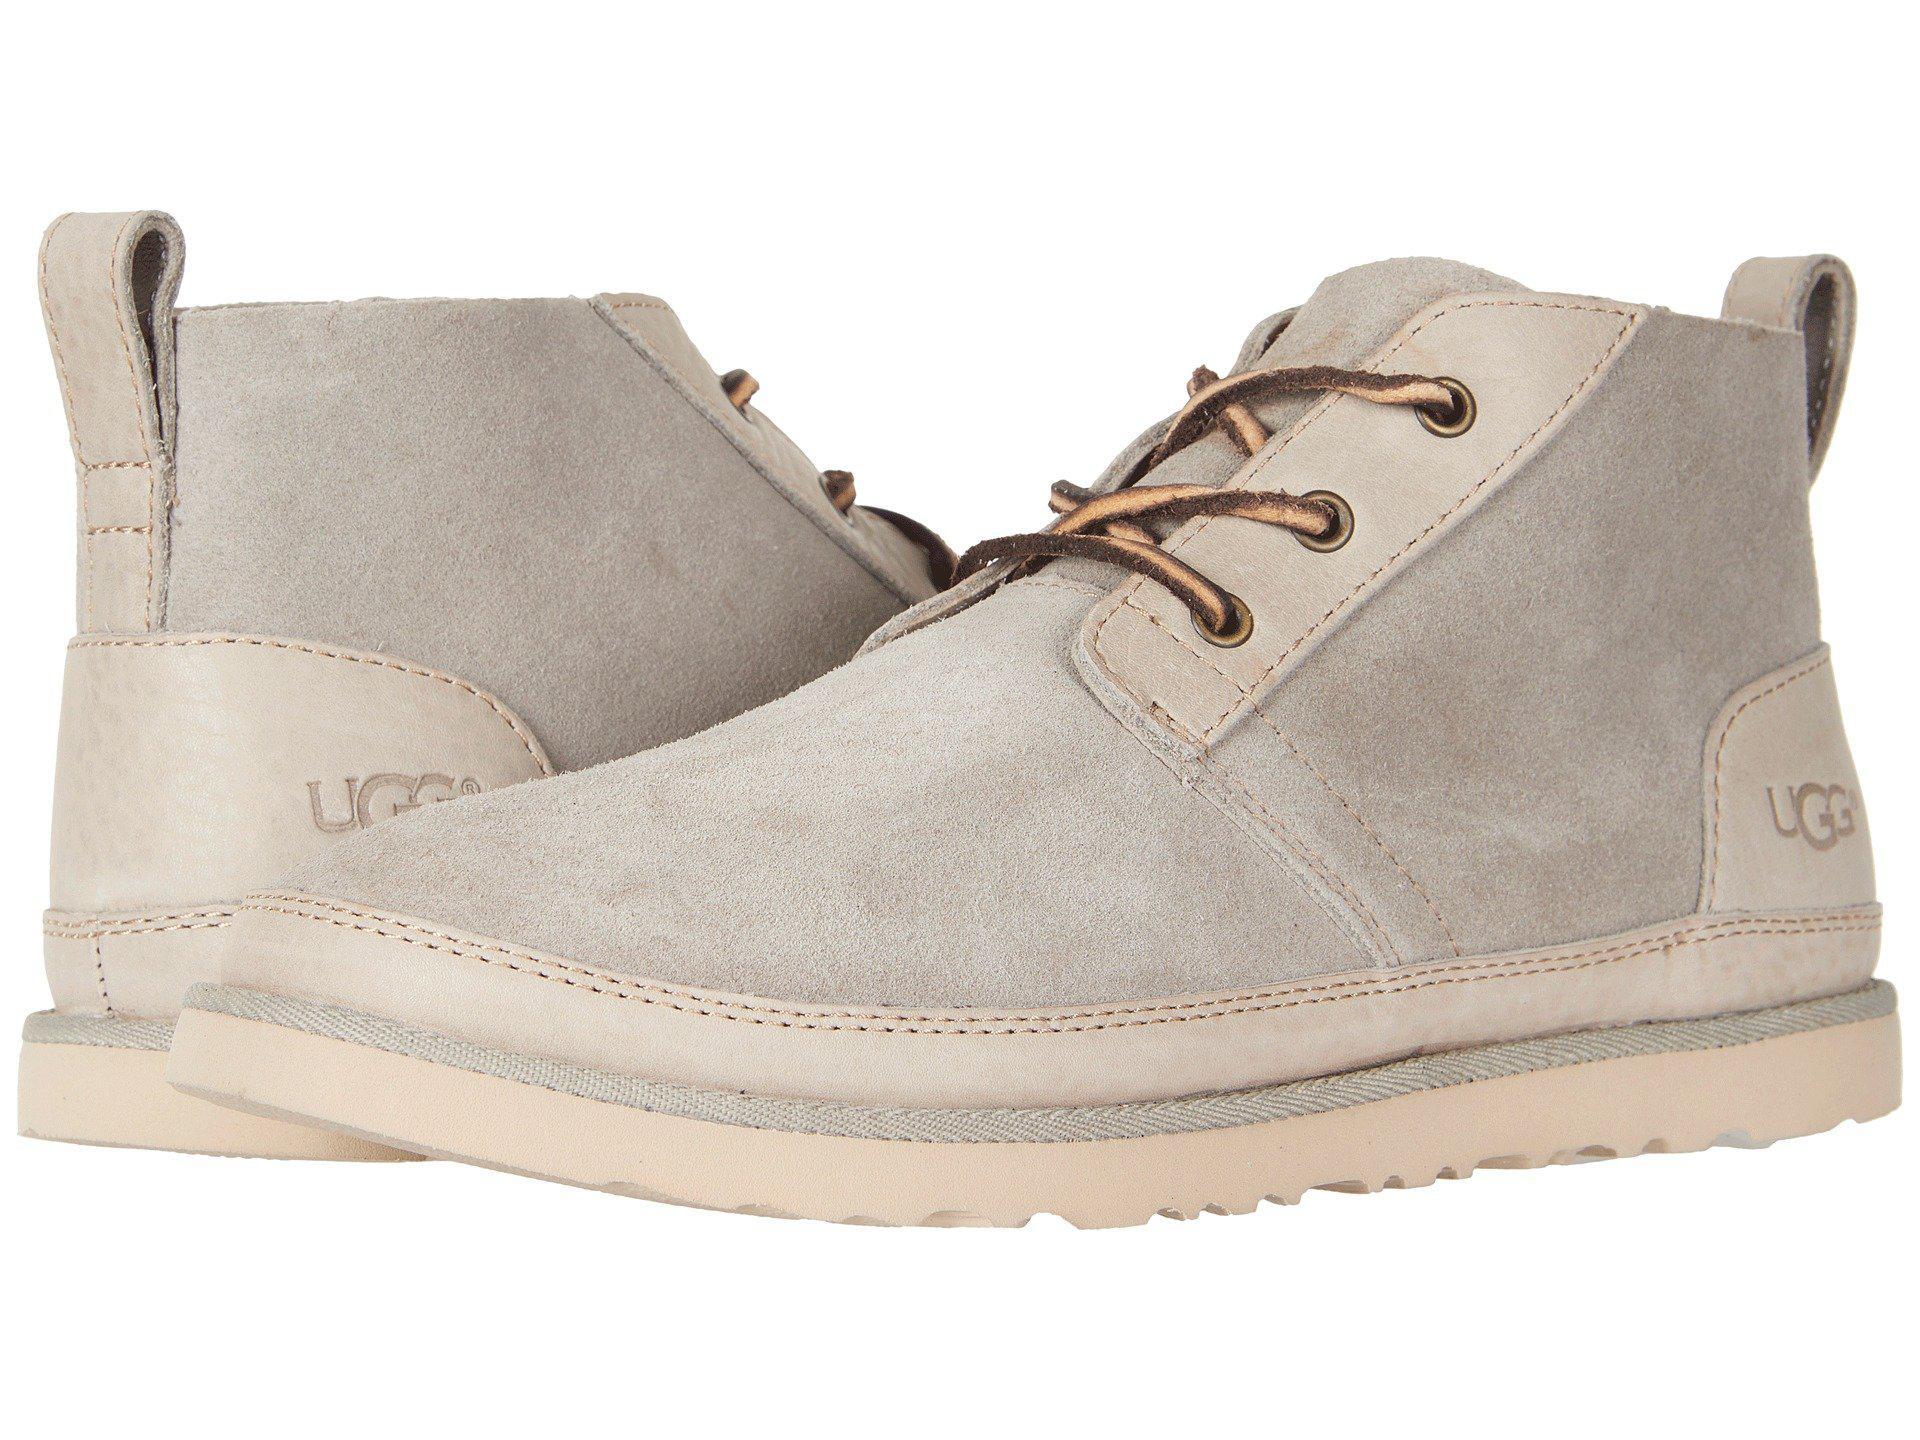 8f3cc0866e7 Ugg Multicolor Neumel Unlined Leather (chestnut) Men's Shoes for men